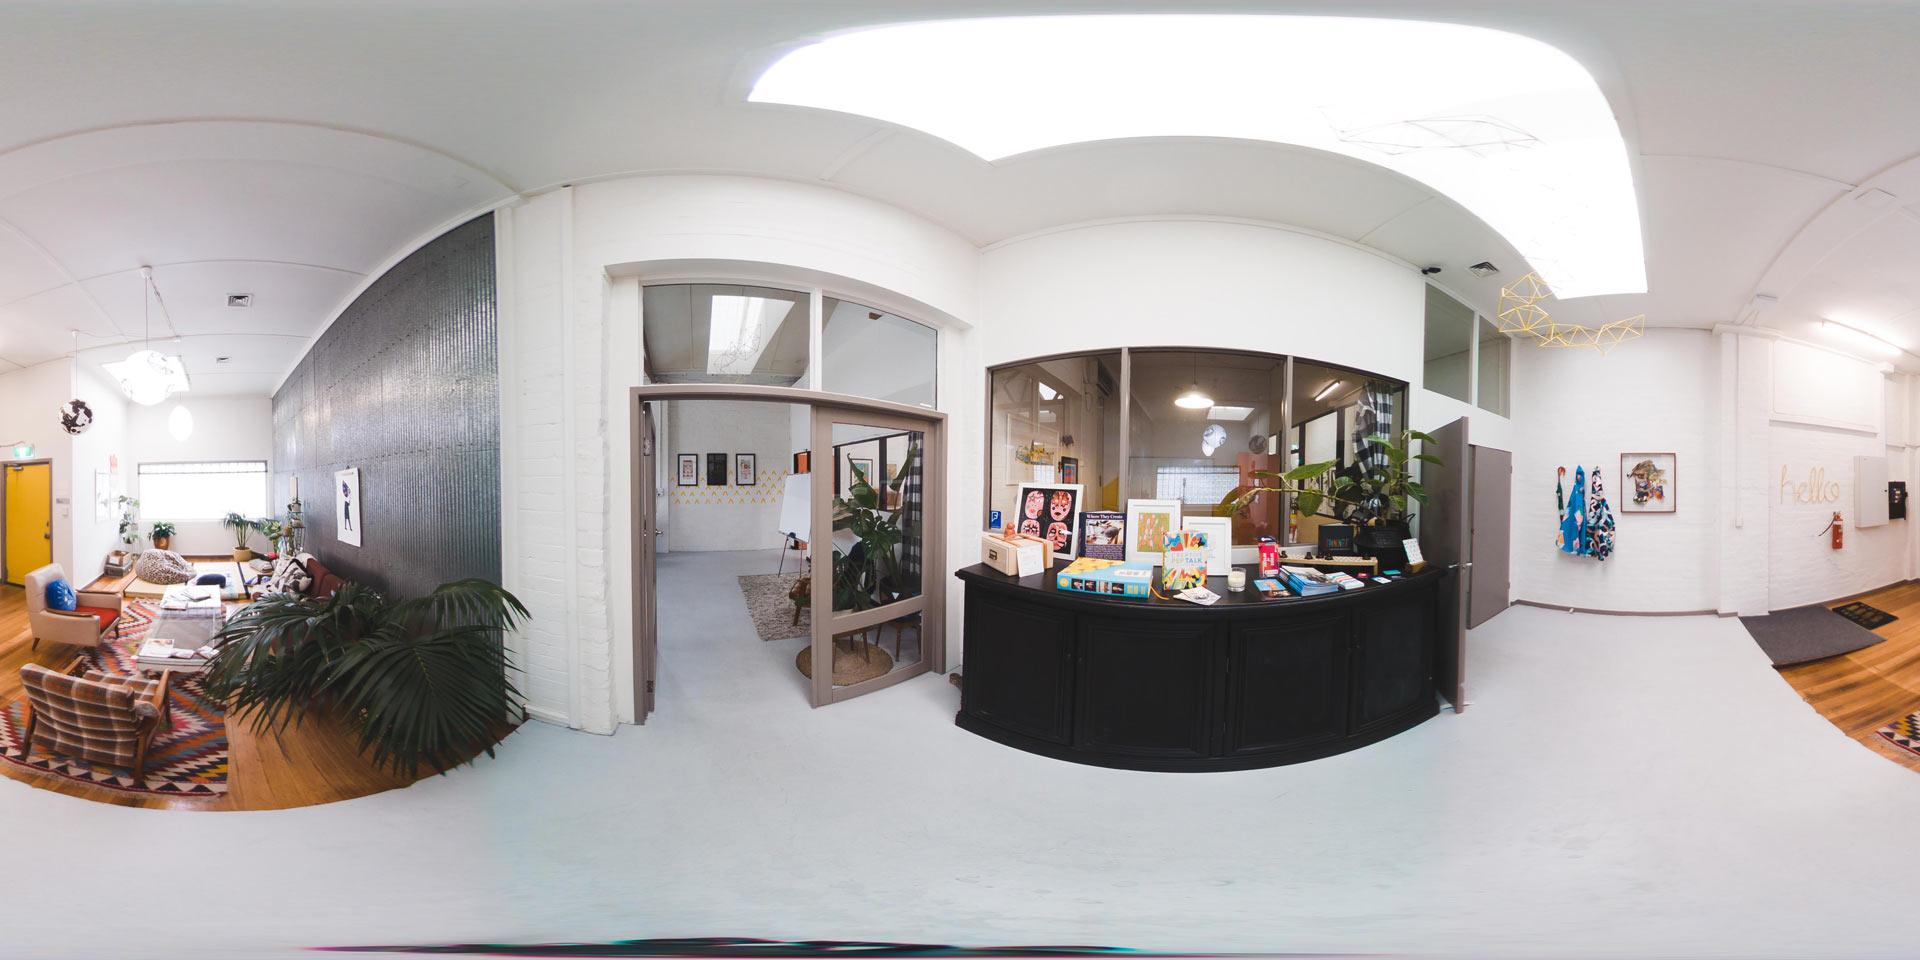 3D Virtual Tour - Path Hunting